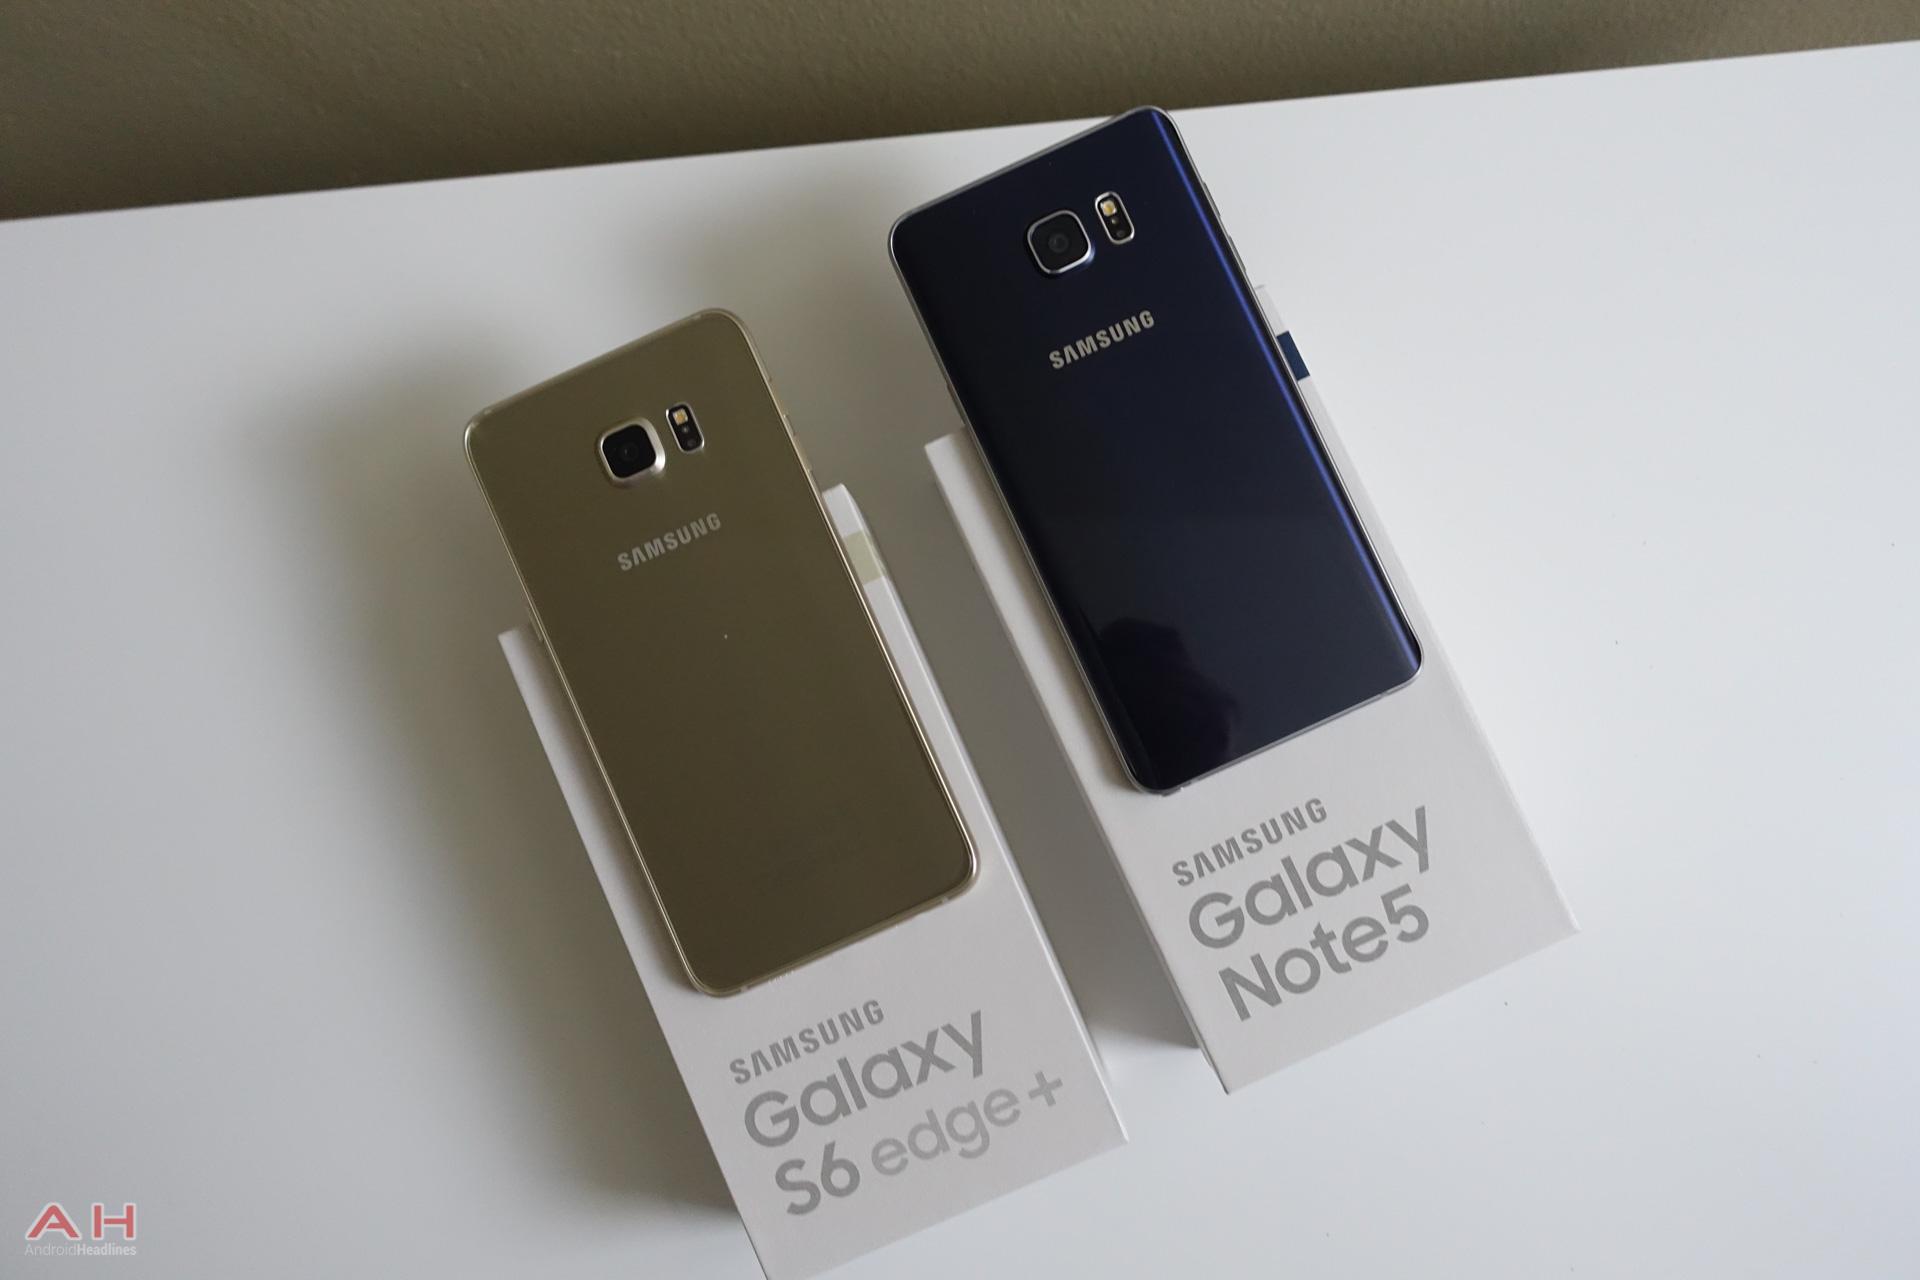 Galaxy-Note-5-Galaxy-S6-Edge-plus-AH-5